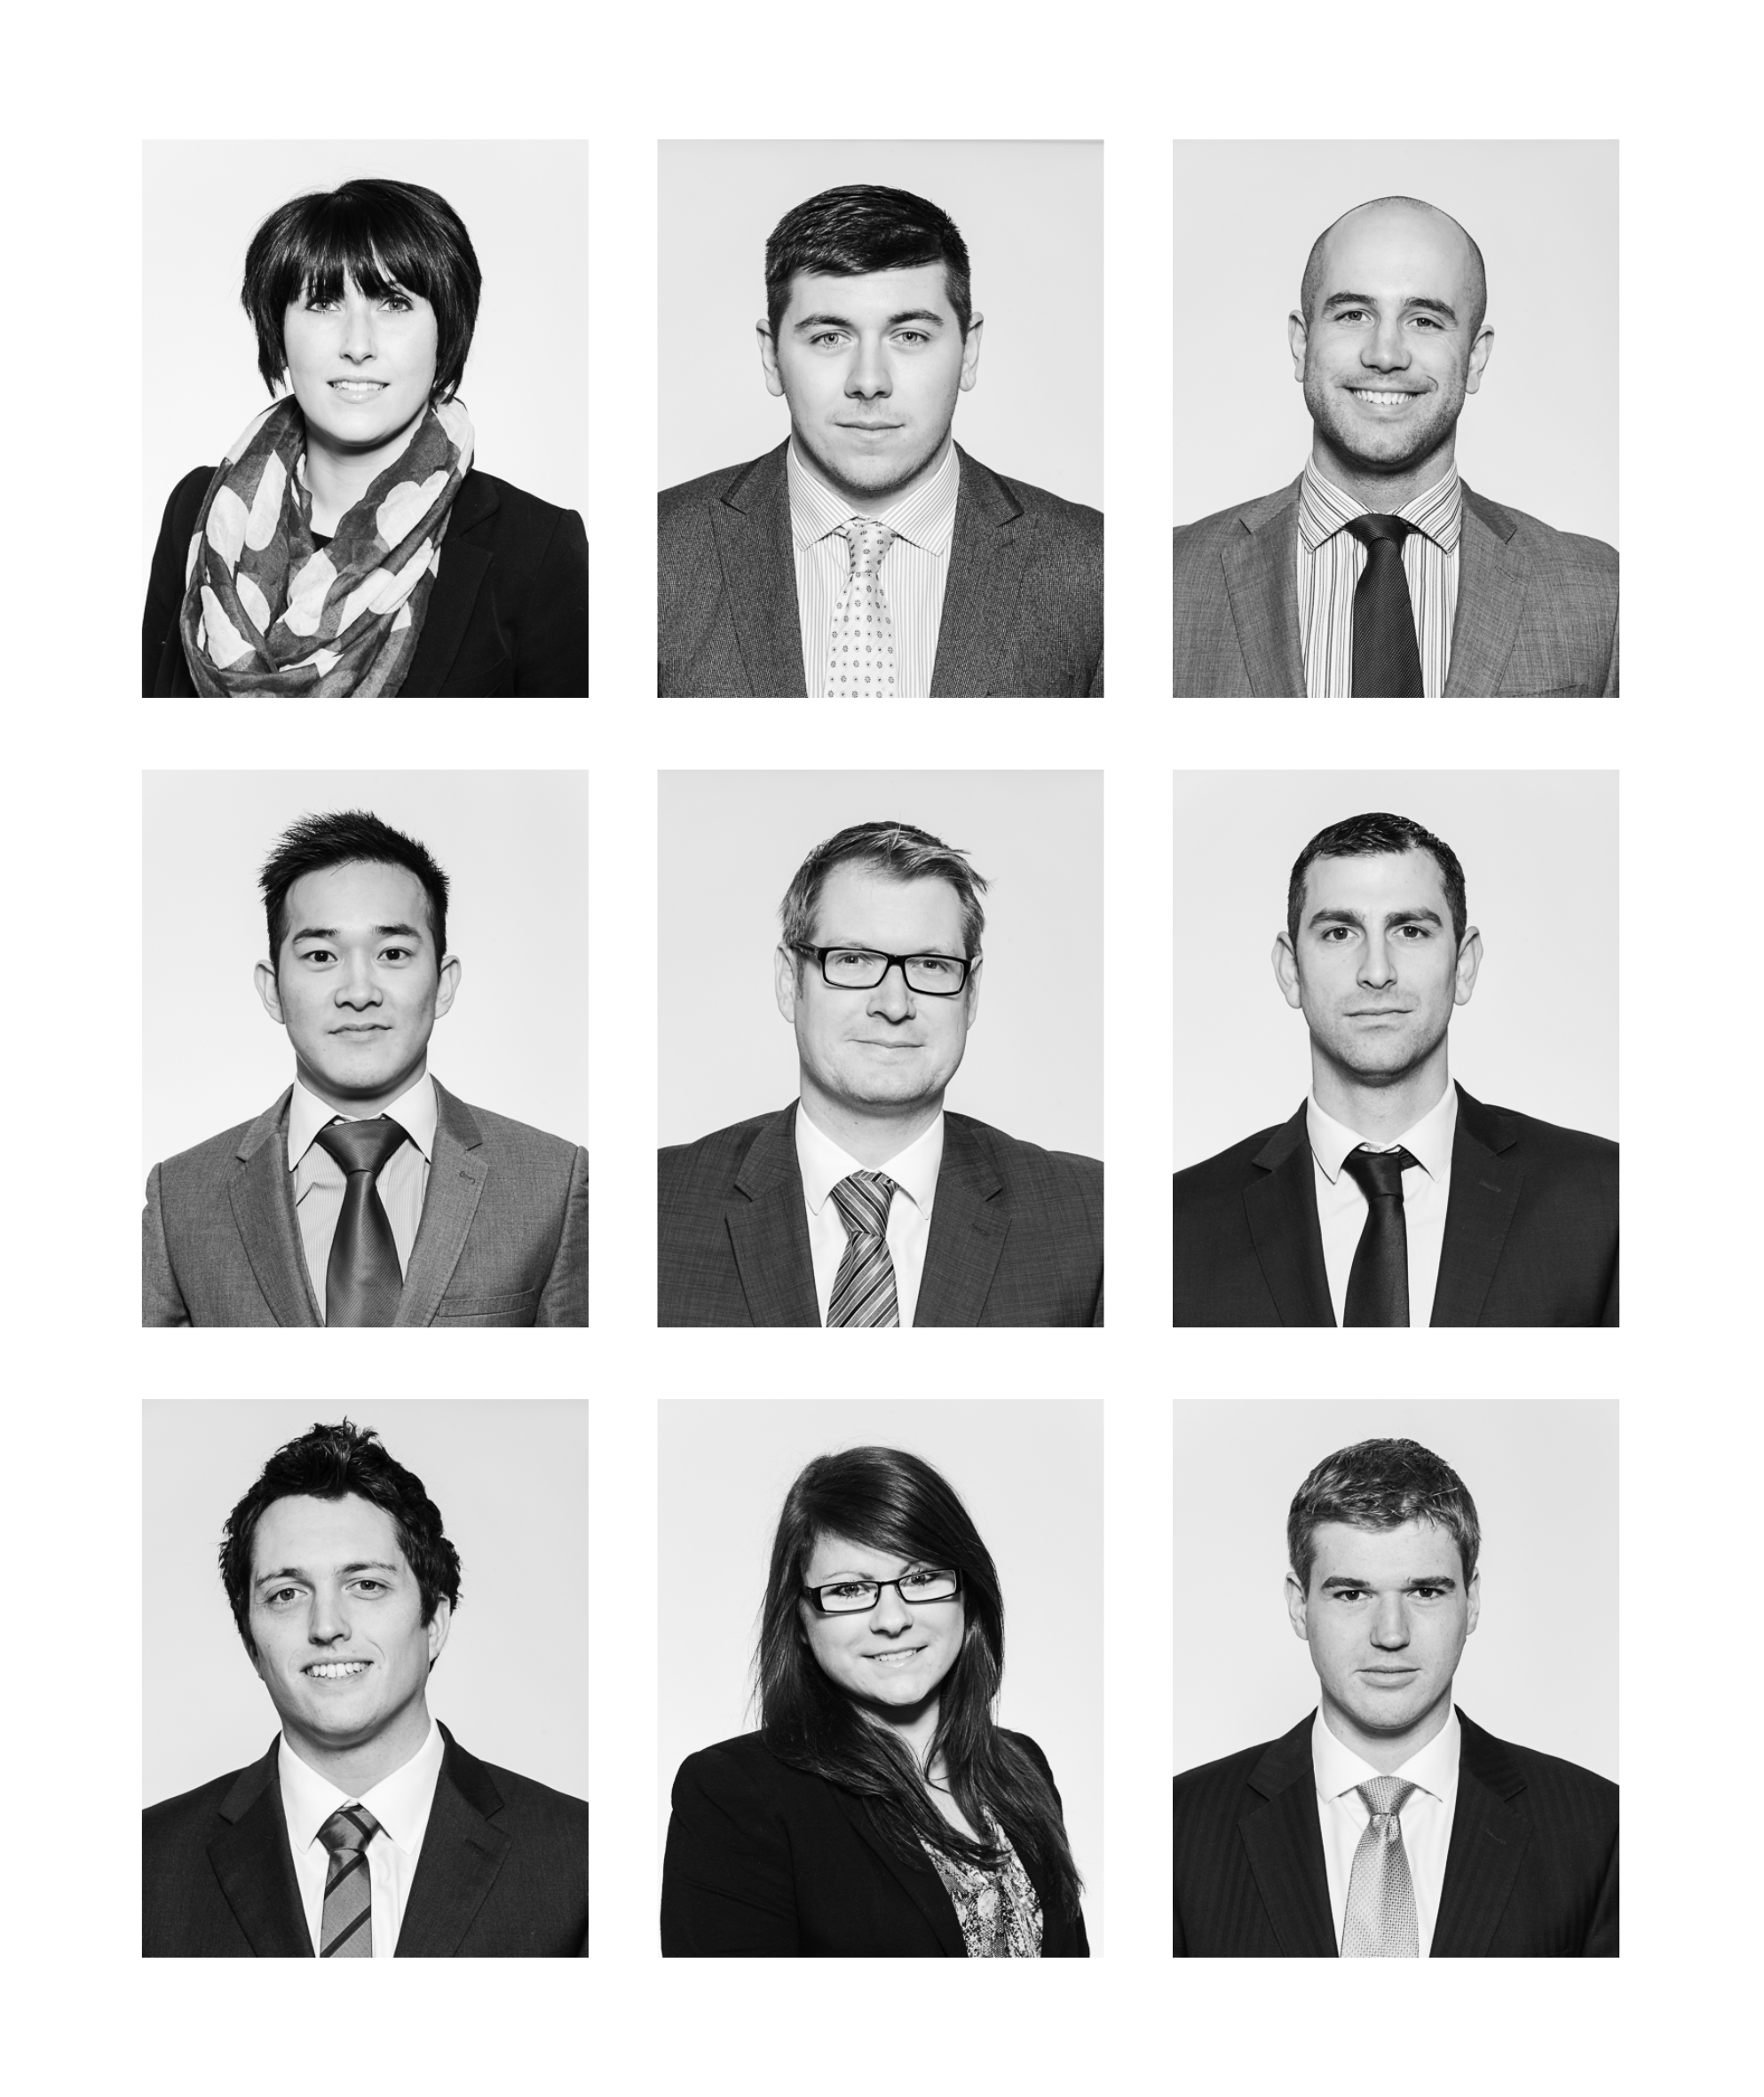 recruitment-company-staff-photos